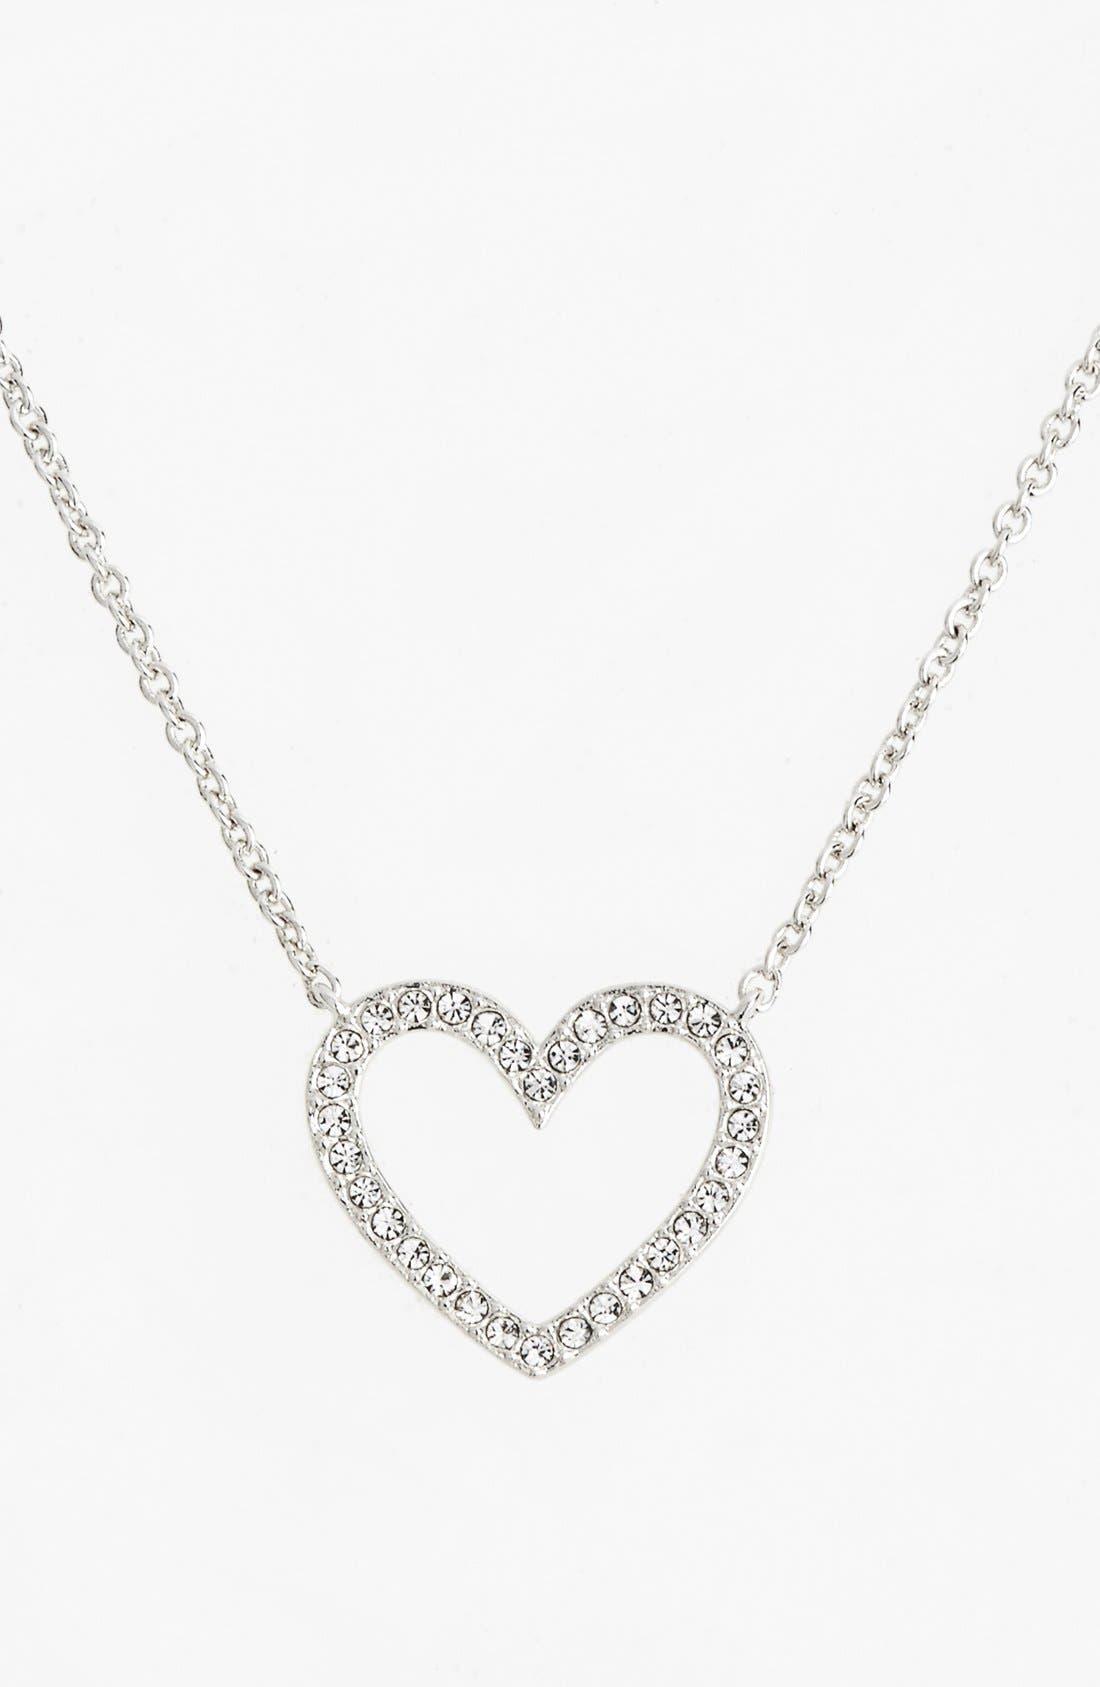 Main Image - Nadri Boxed Heart Pendant Necklace